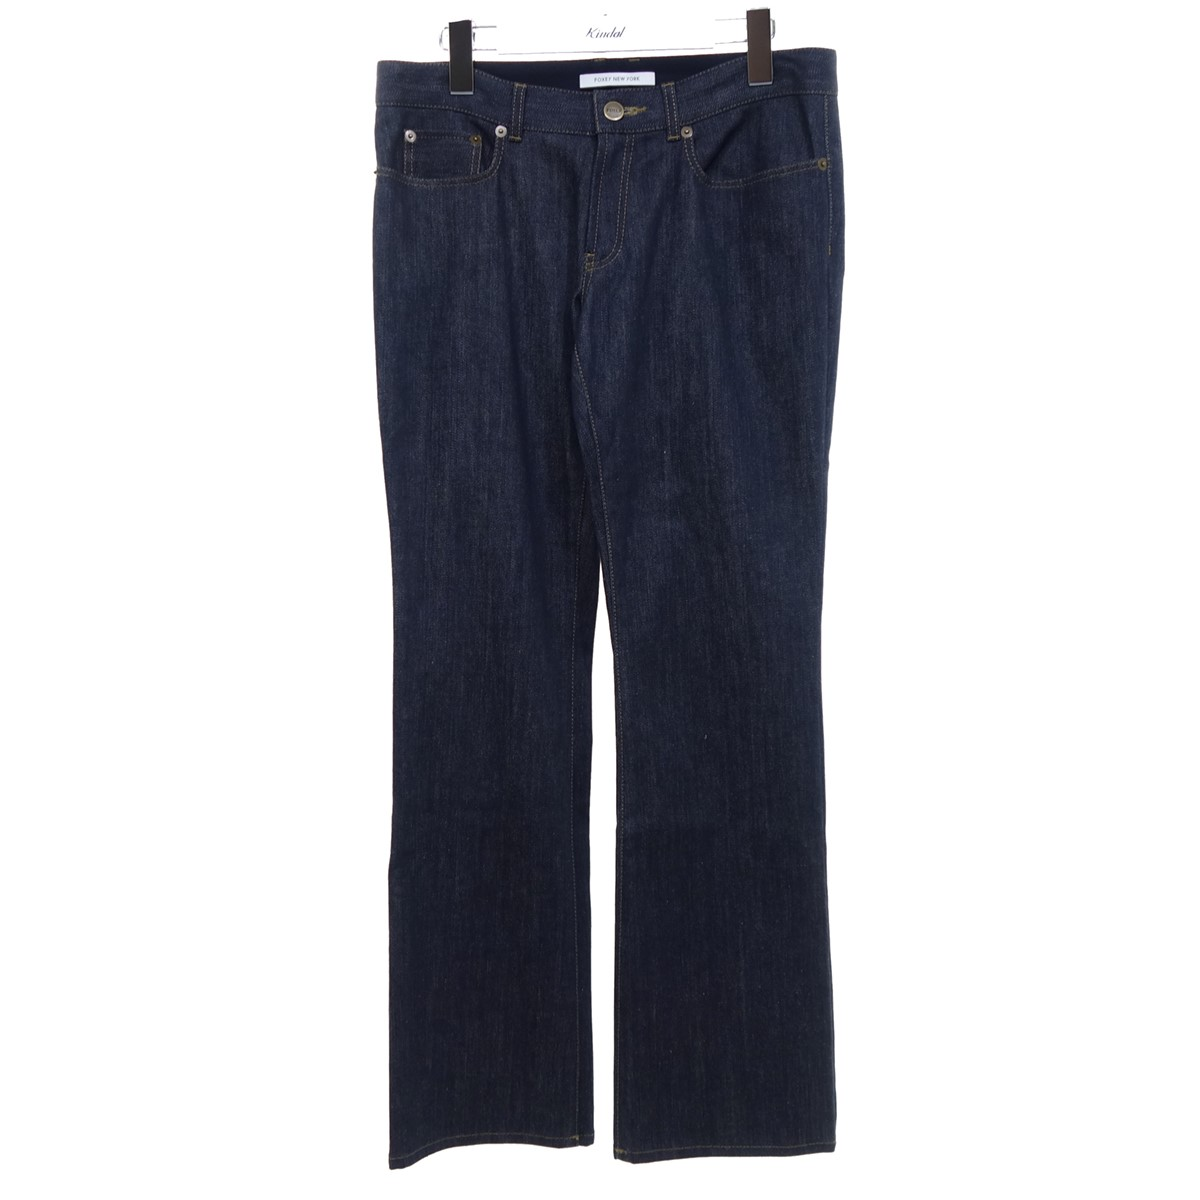 FOXEY NEWYORK デニムパンツ 35807 インディゴ サイズ:40 【160920】(フォクシーニューヨーク):ブランド古着のカインドオル